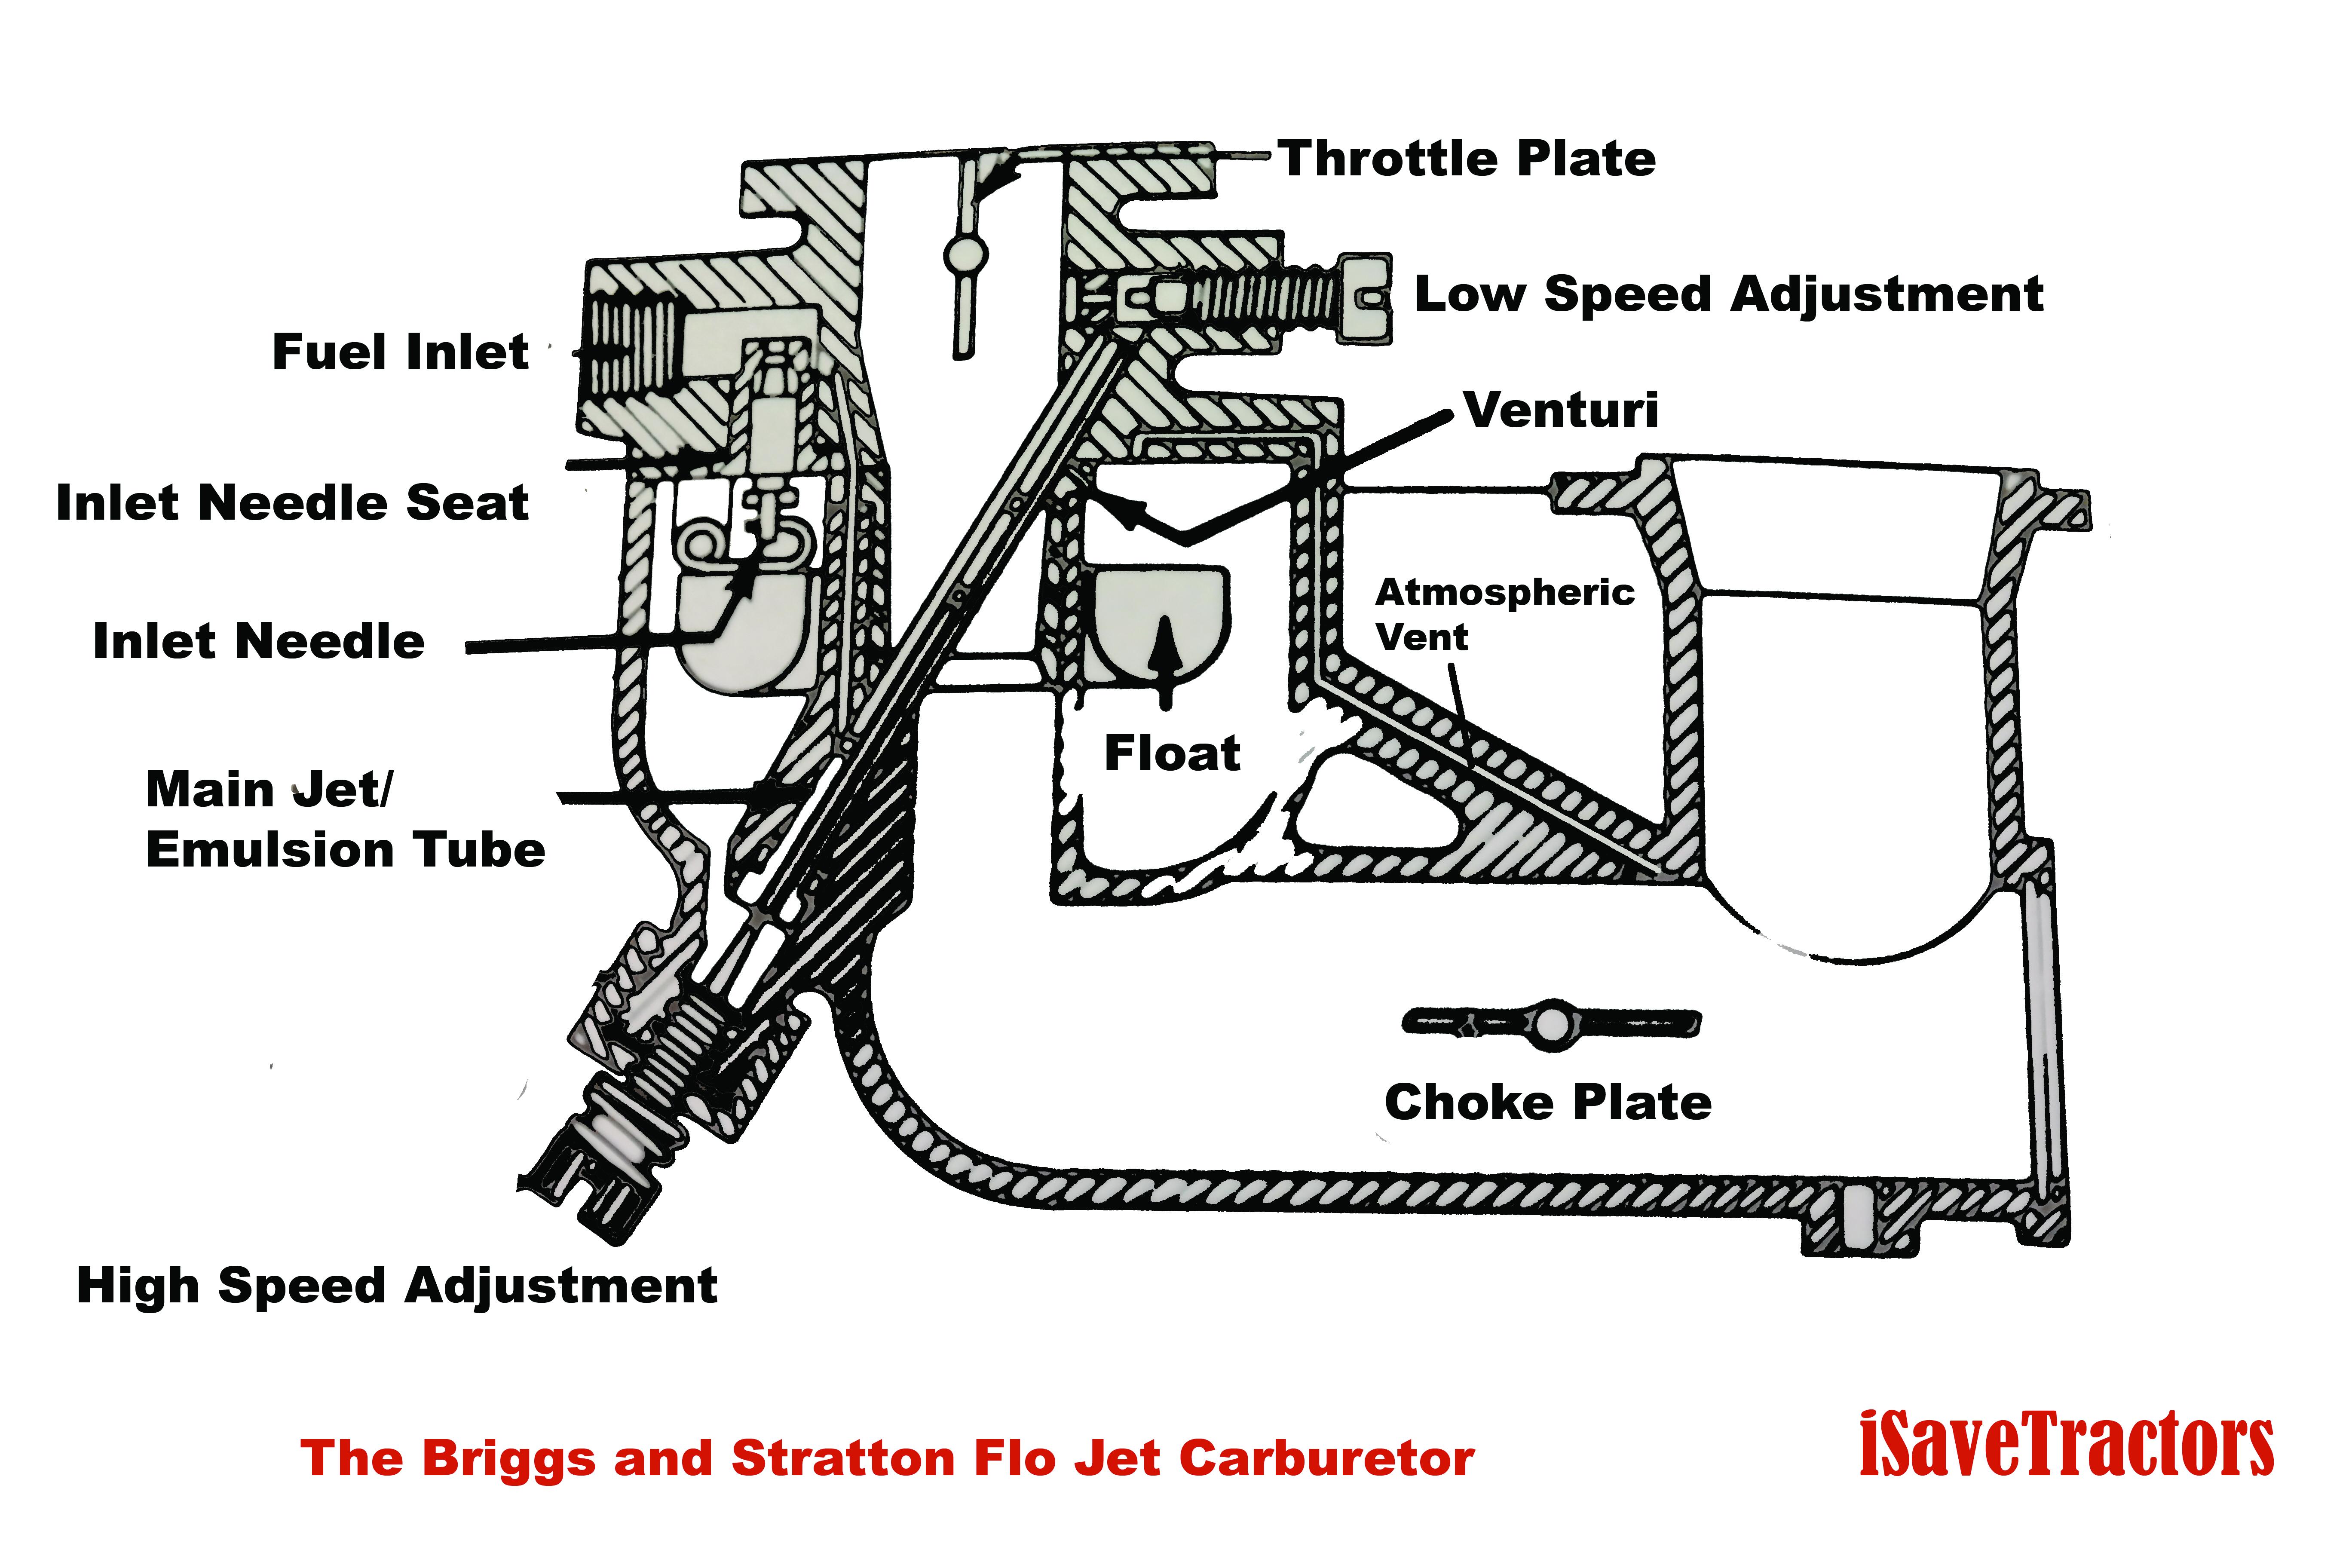 10 Hp Tecumseh Engine Carburetor Diagram Wiring Diagrams For Dummies Ohv Specs Images Gallery